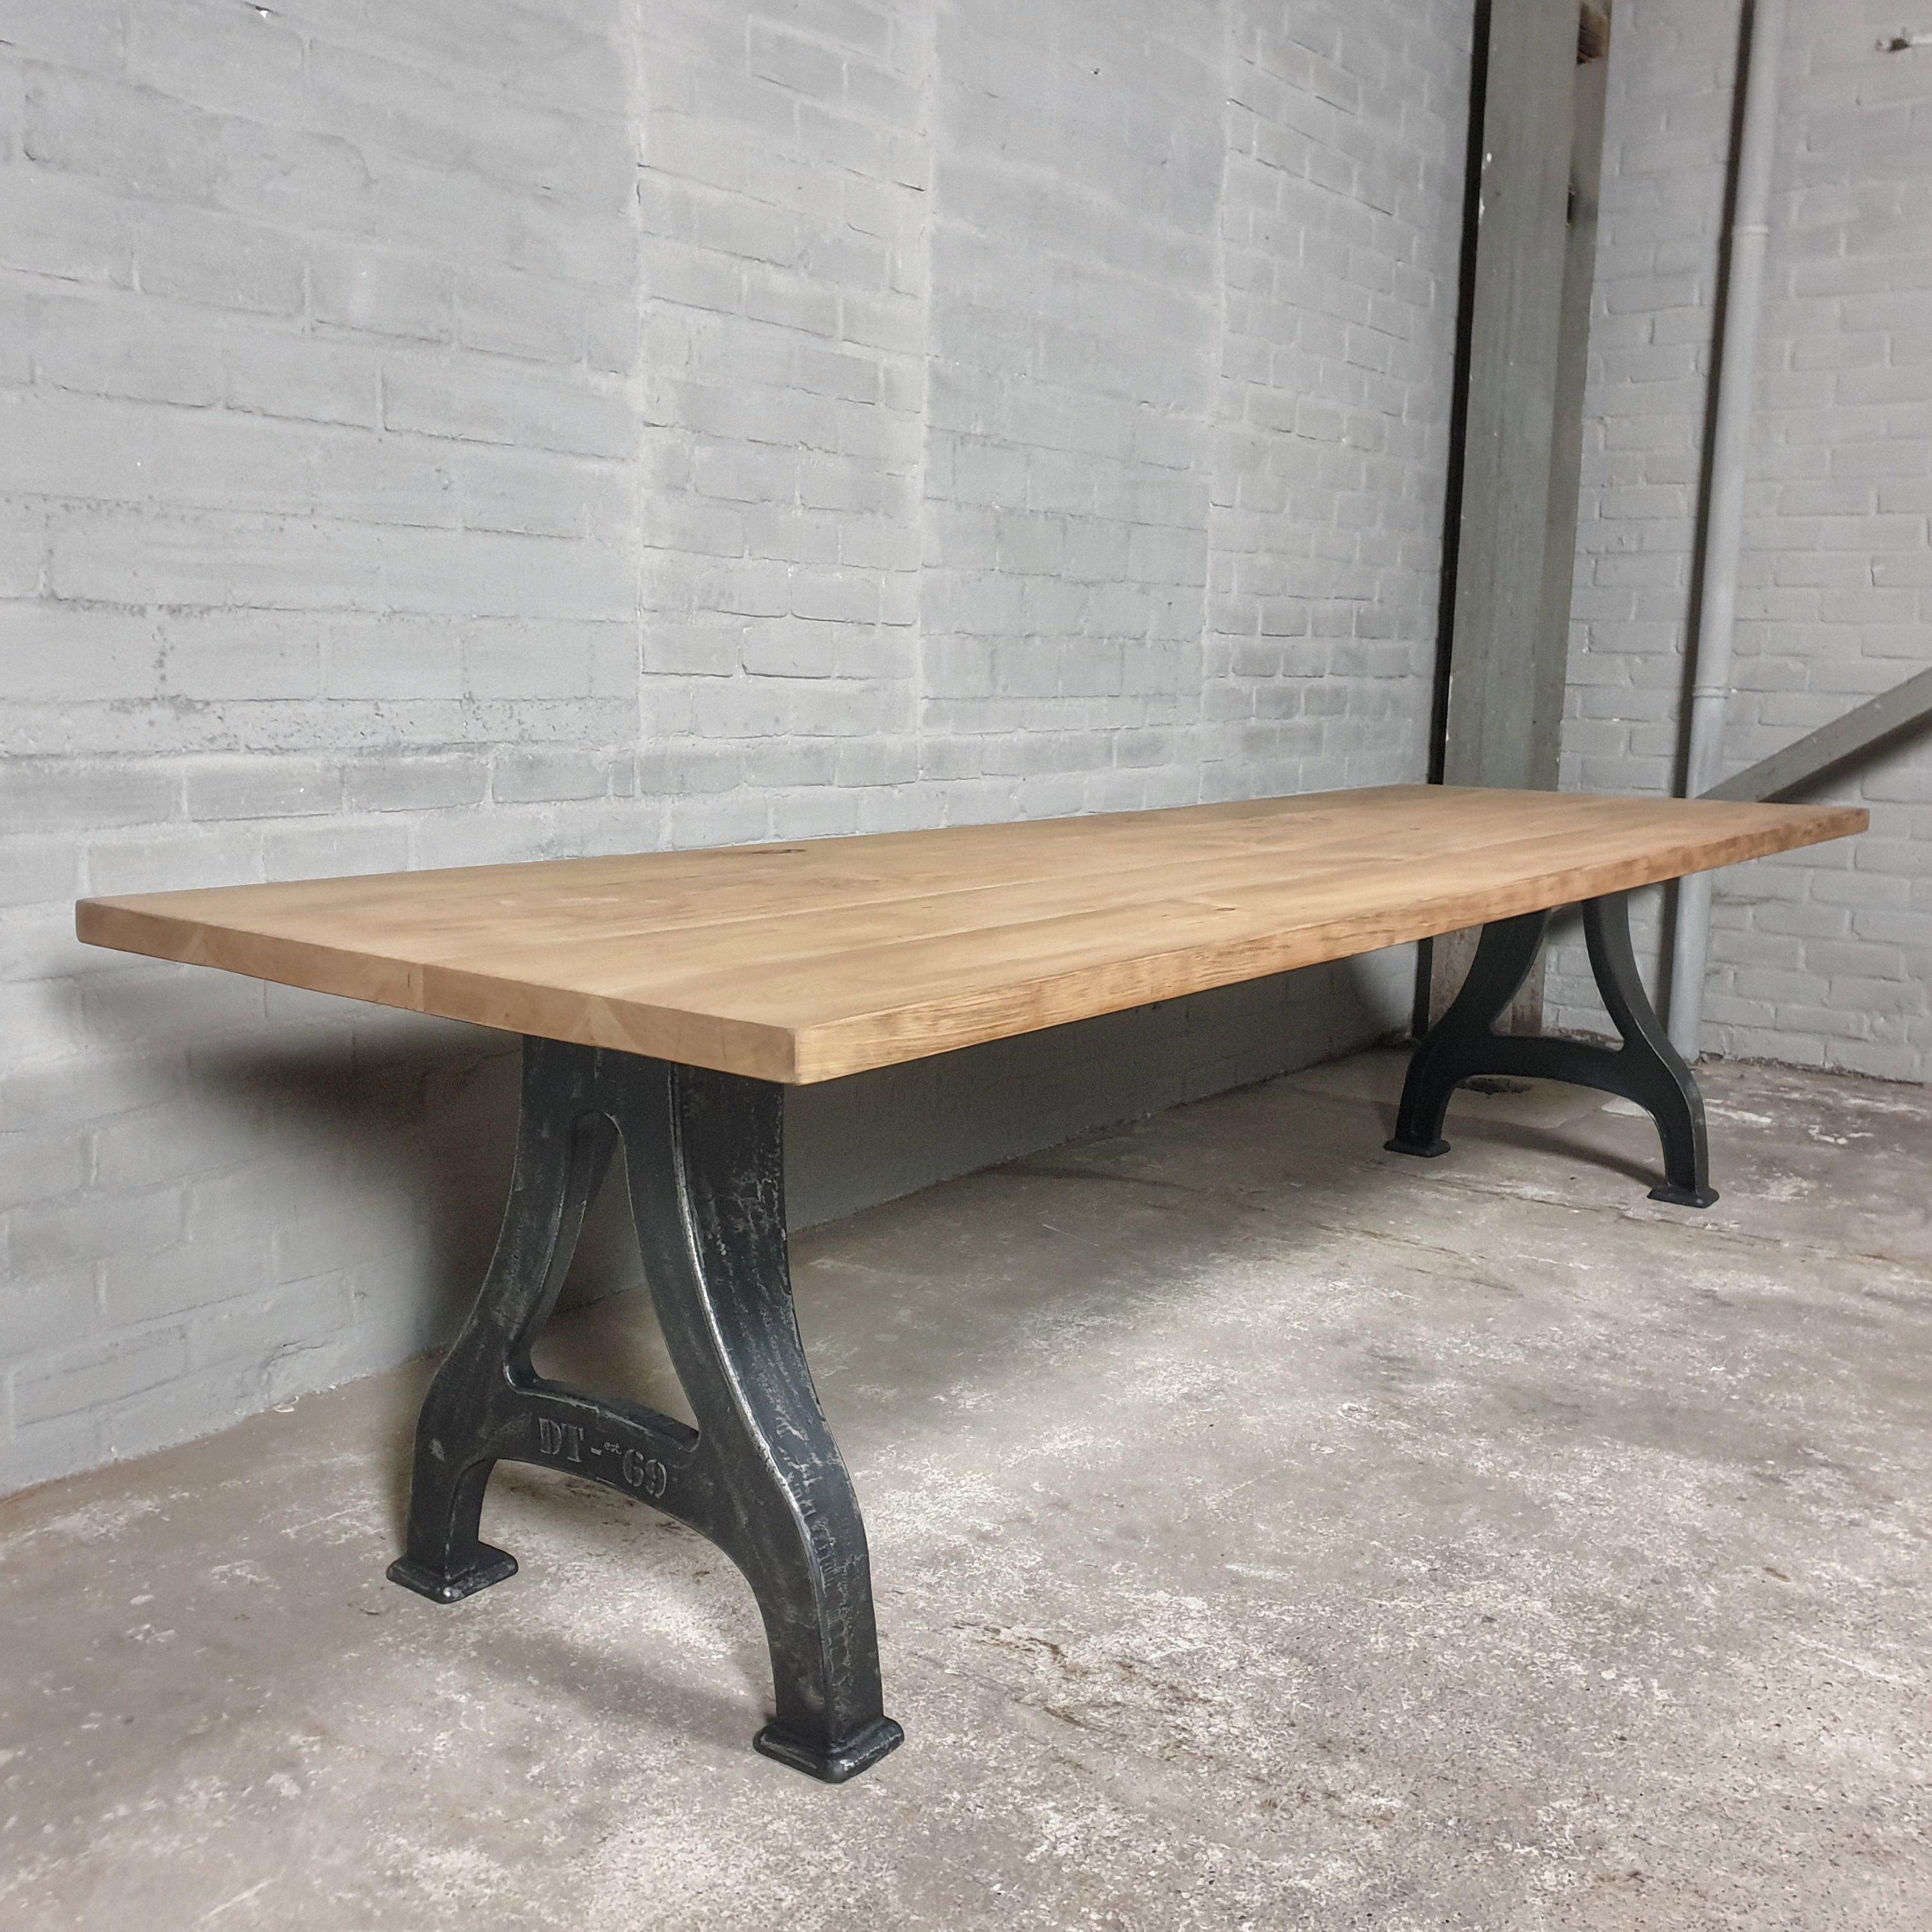 Industrie Design Tisch – Gusseisen Tischgestell - massivem rustikalem Kirschholz Tischplatte - IND724